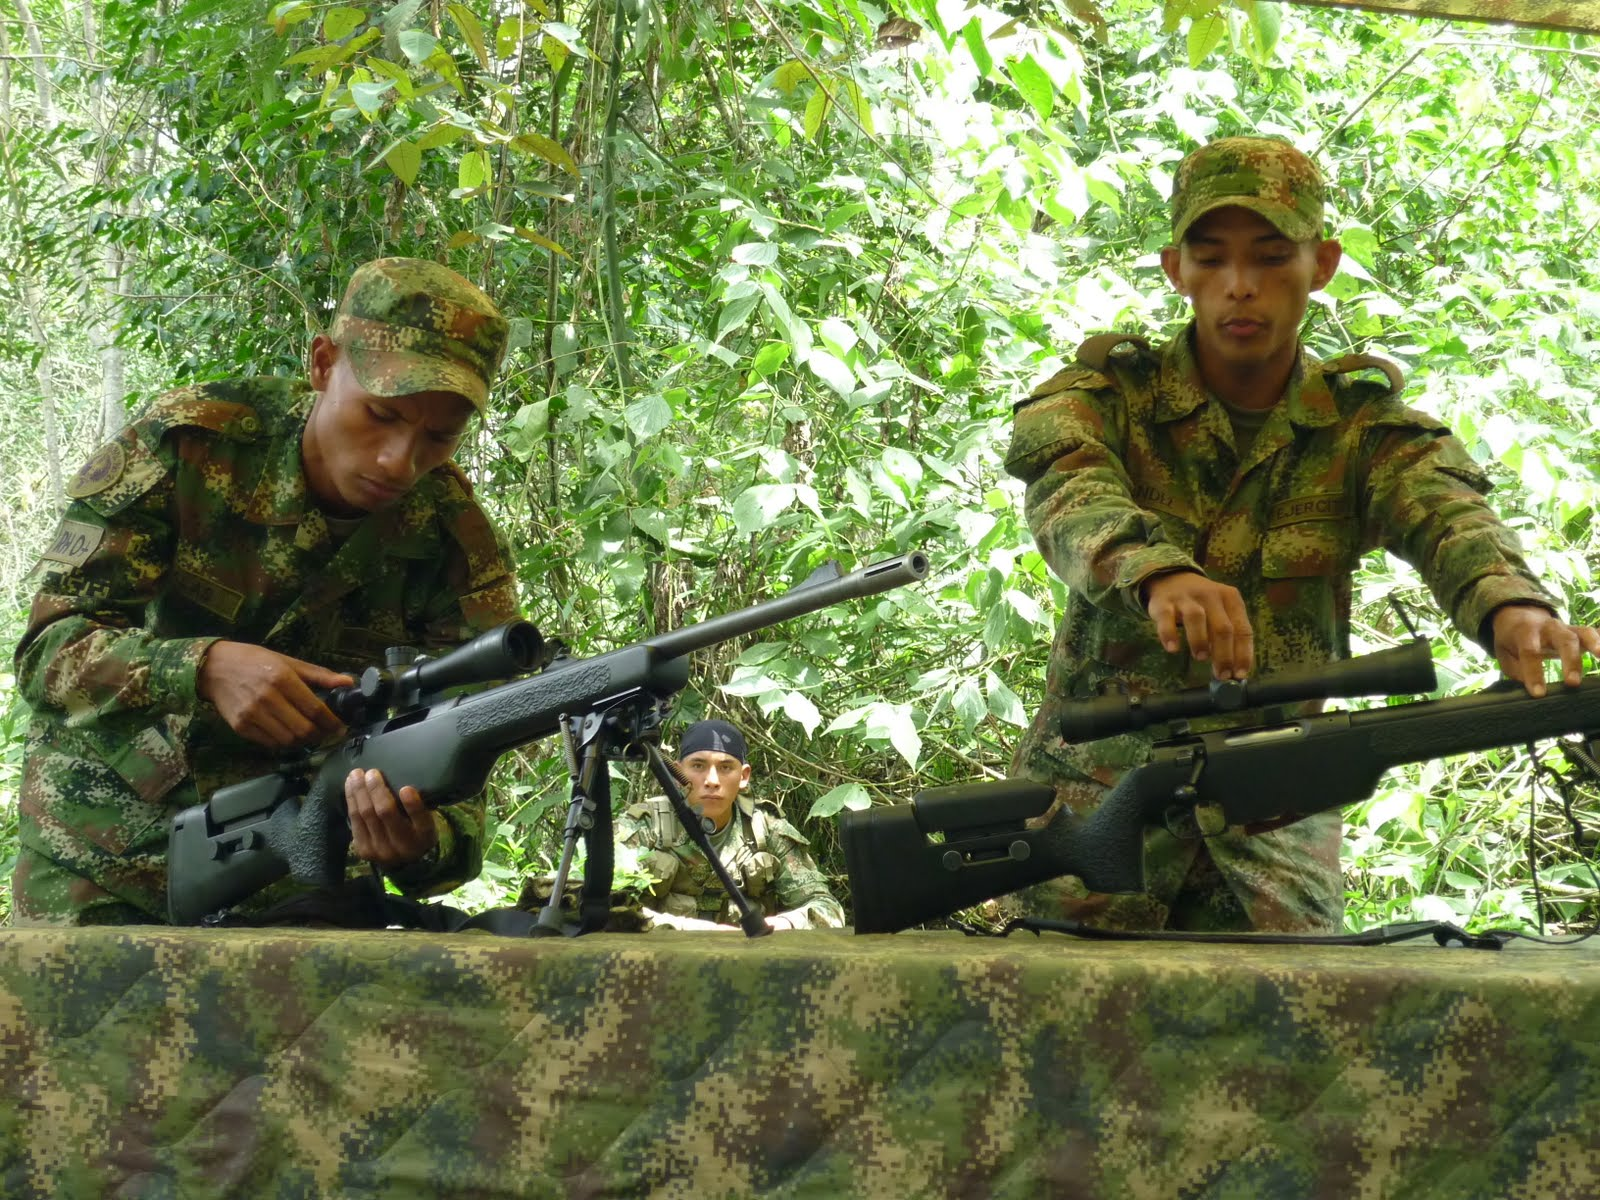 Hacia La 9 00 De La Manana Arribamos A La Guardia De La Unidad Militar